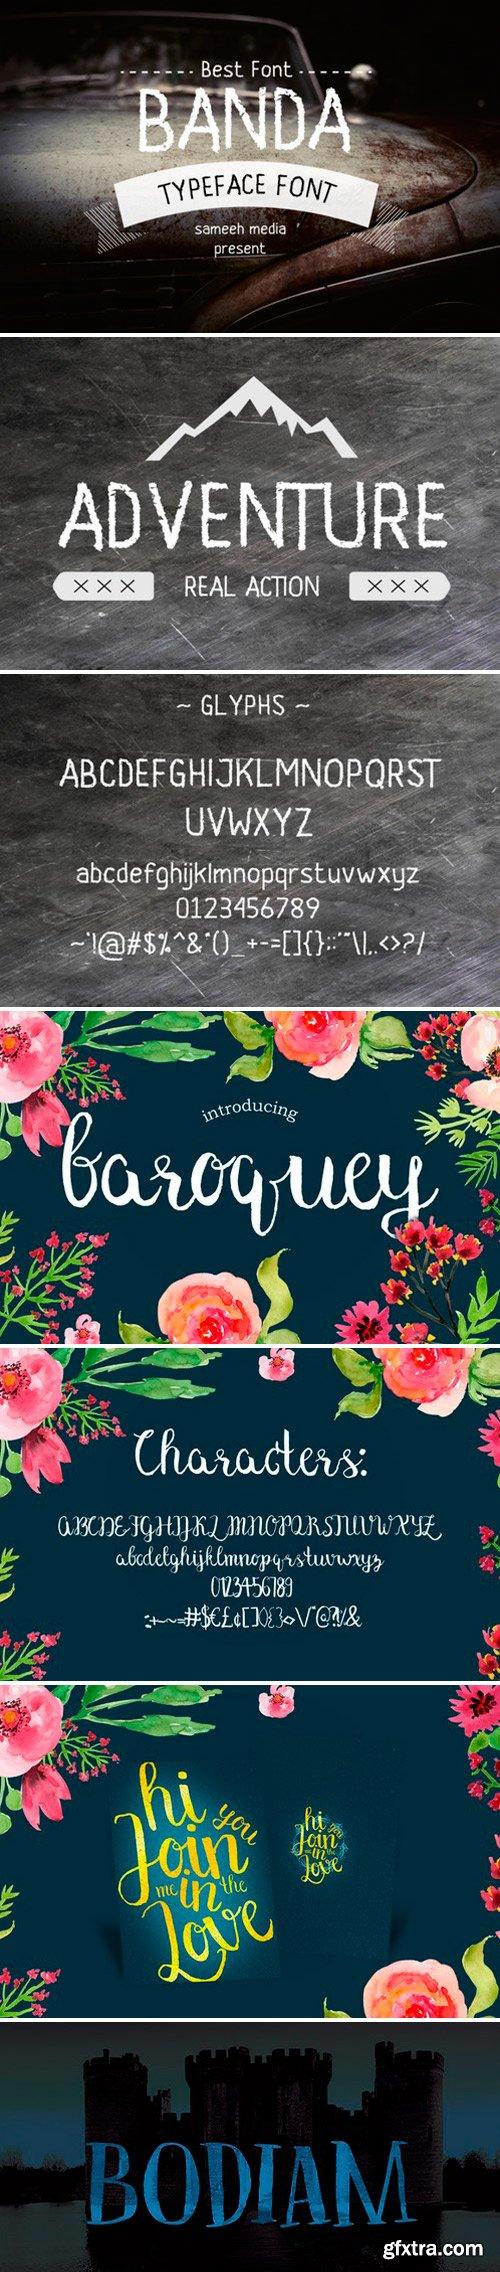 Bodiam, Baroquey Script, Banda-Font-Typeface